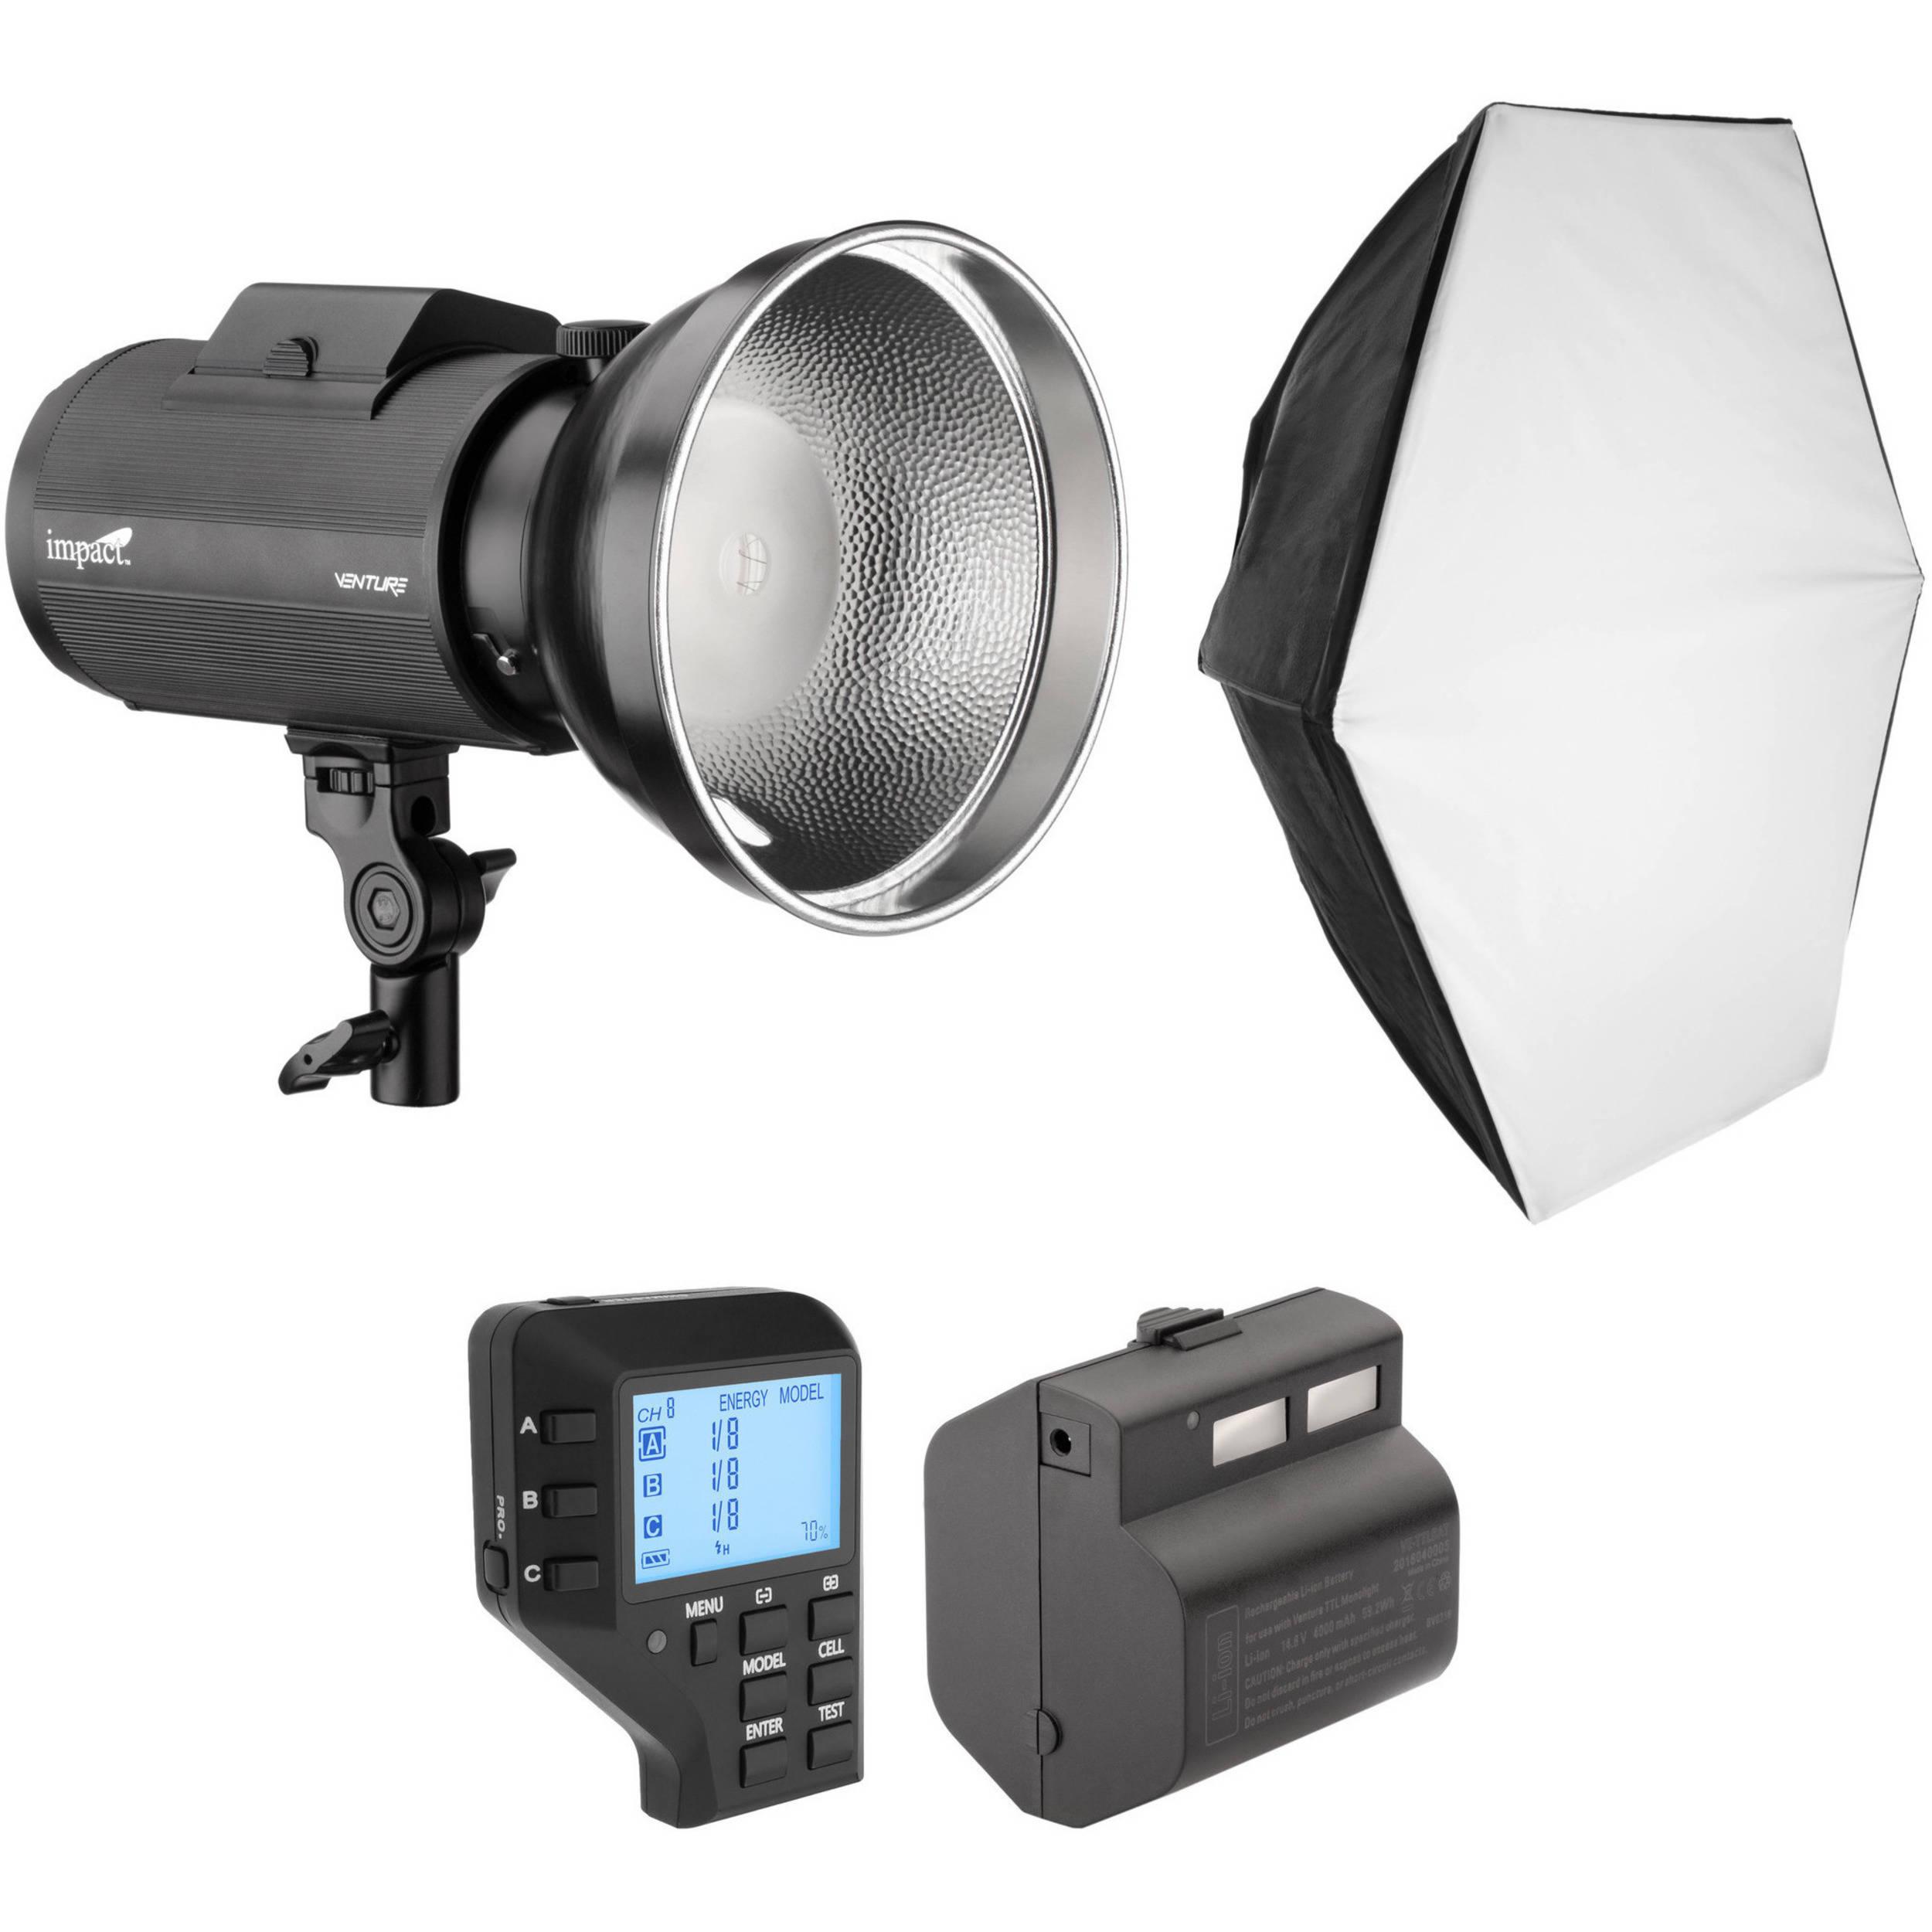 Impact Venture TTL-600 Battery-Powered Monolight Kit with Nikon Controller  sc 1 st  Bu0026H & Monolight Lighting Kits | Bu0026H Photo Video azcodes.com